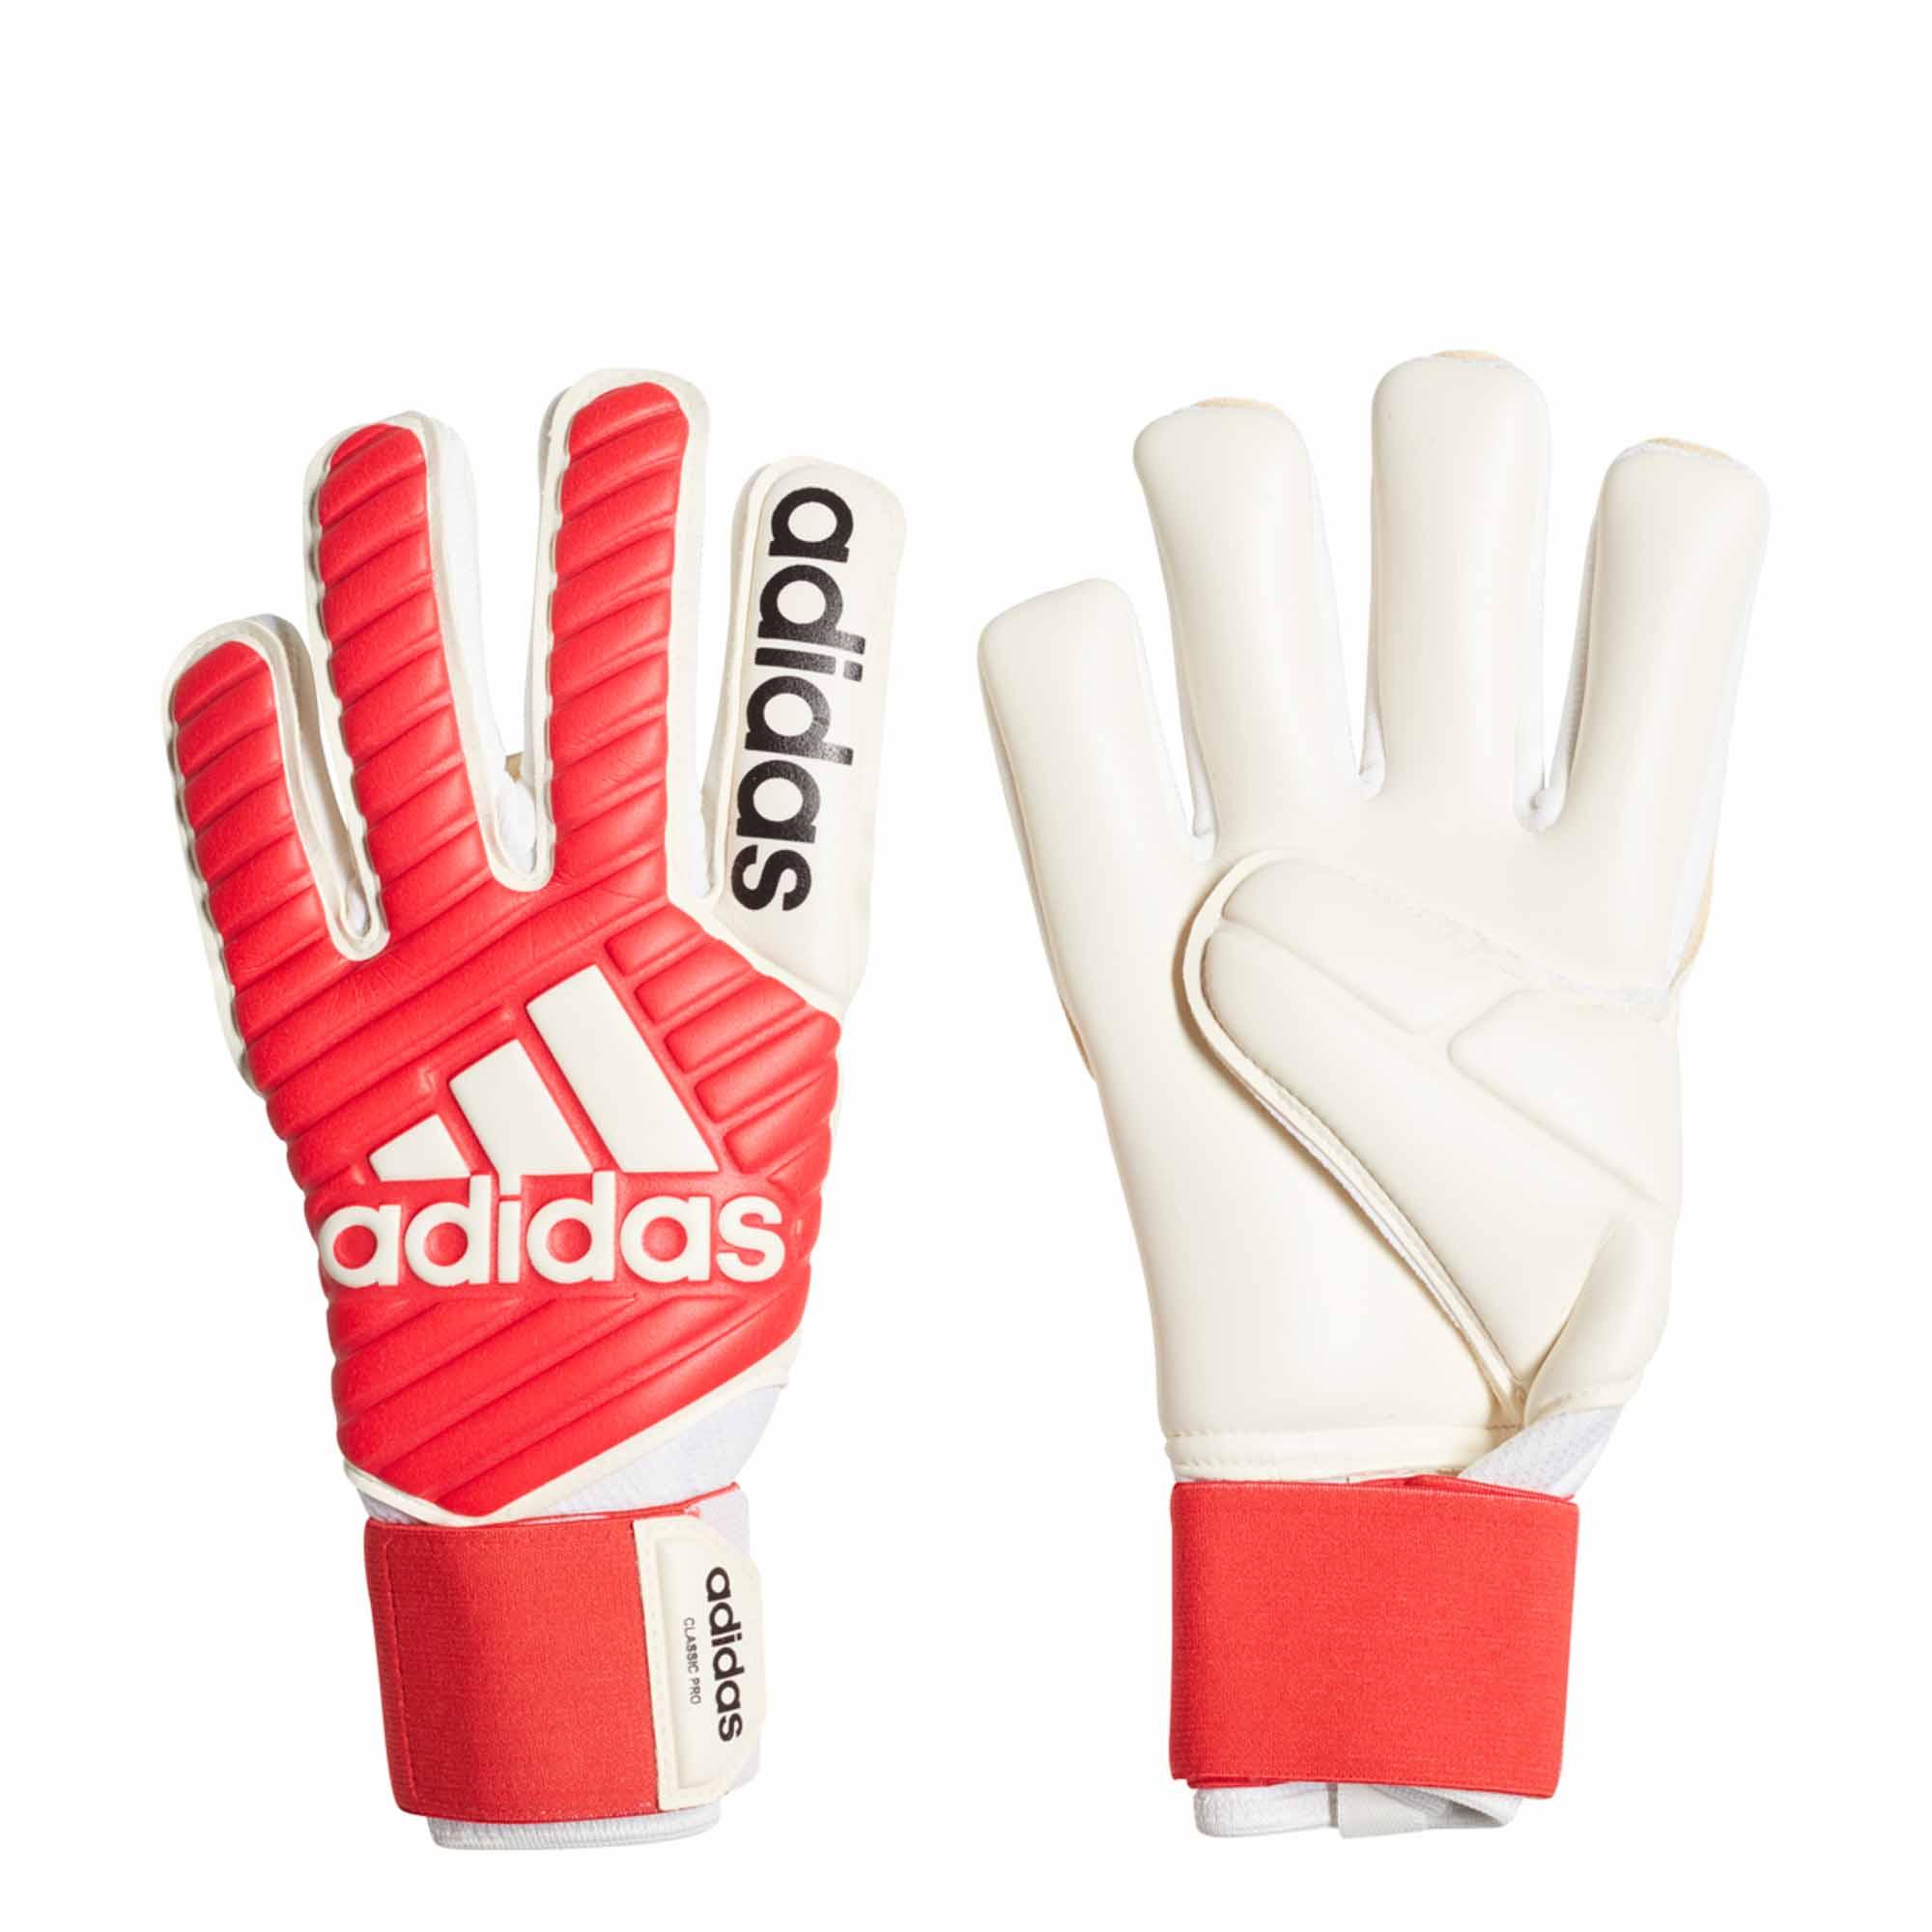 9fcf36e7b adidas Classic Pro Goalkeeper Gloves - Real Coral White - SoccerPro